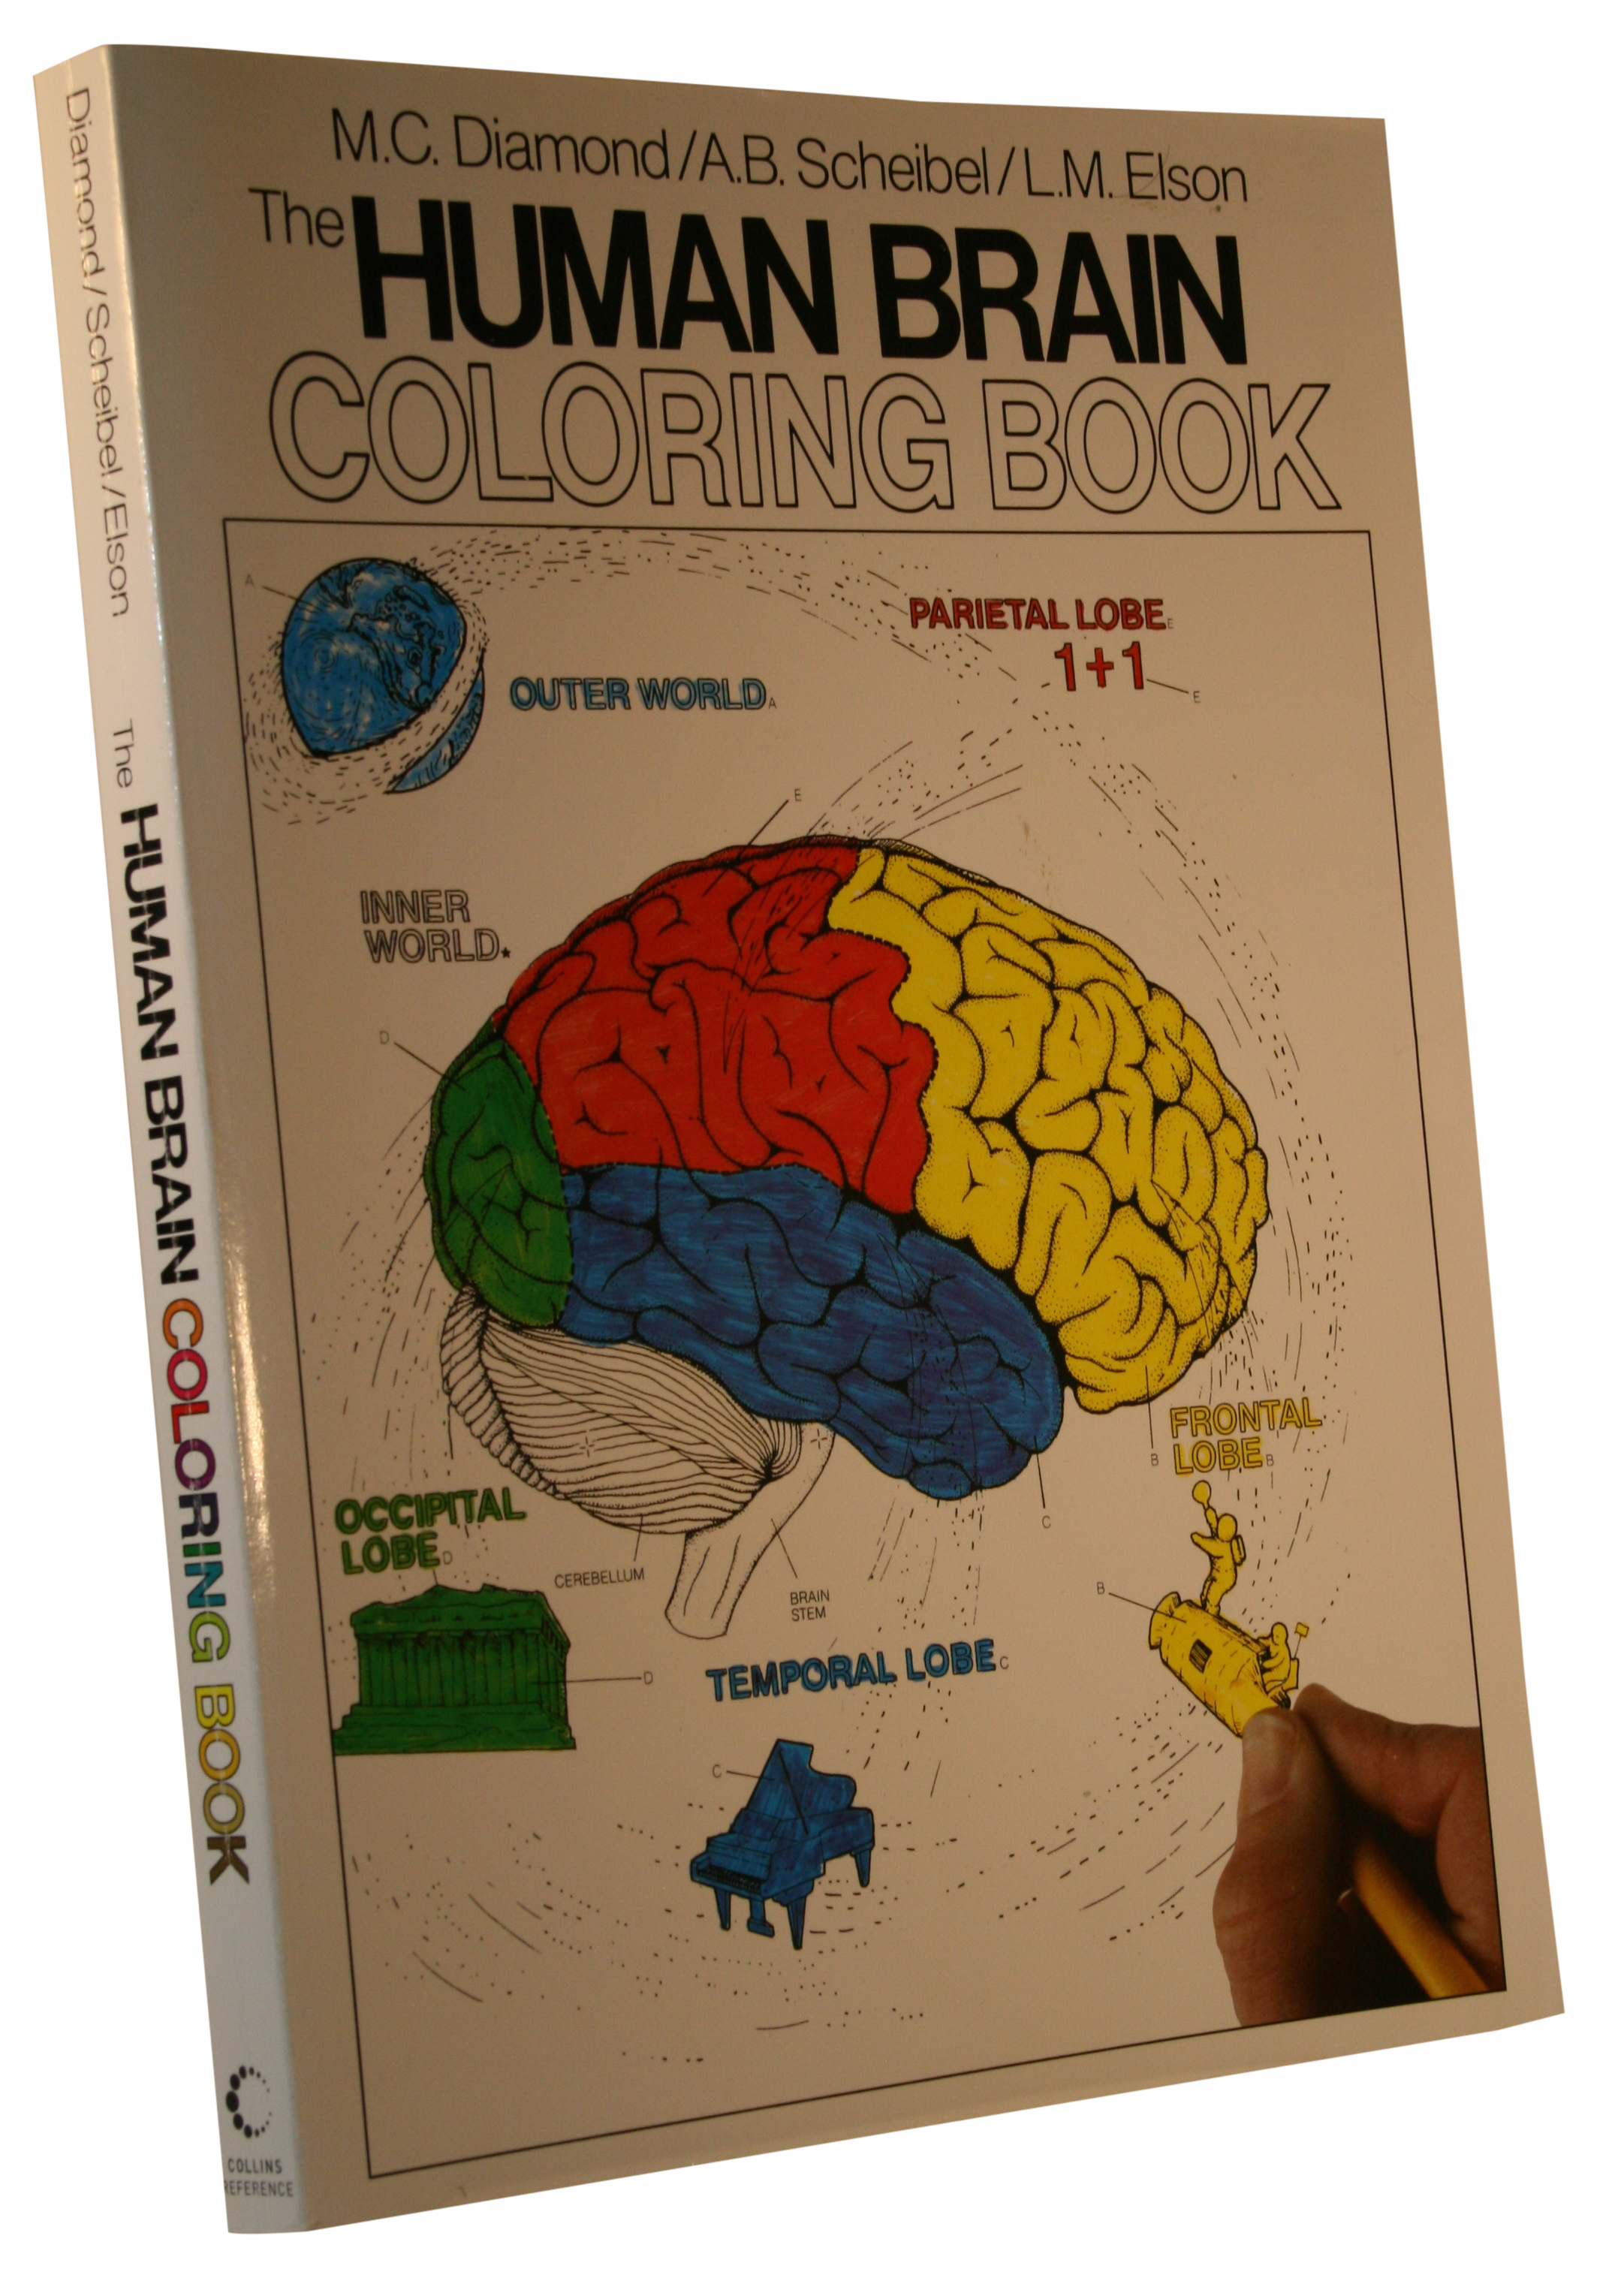 The Human Brain Coloring Book.